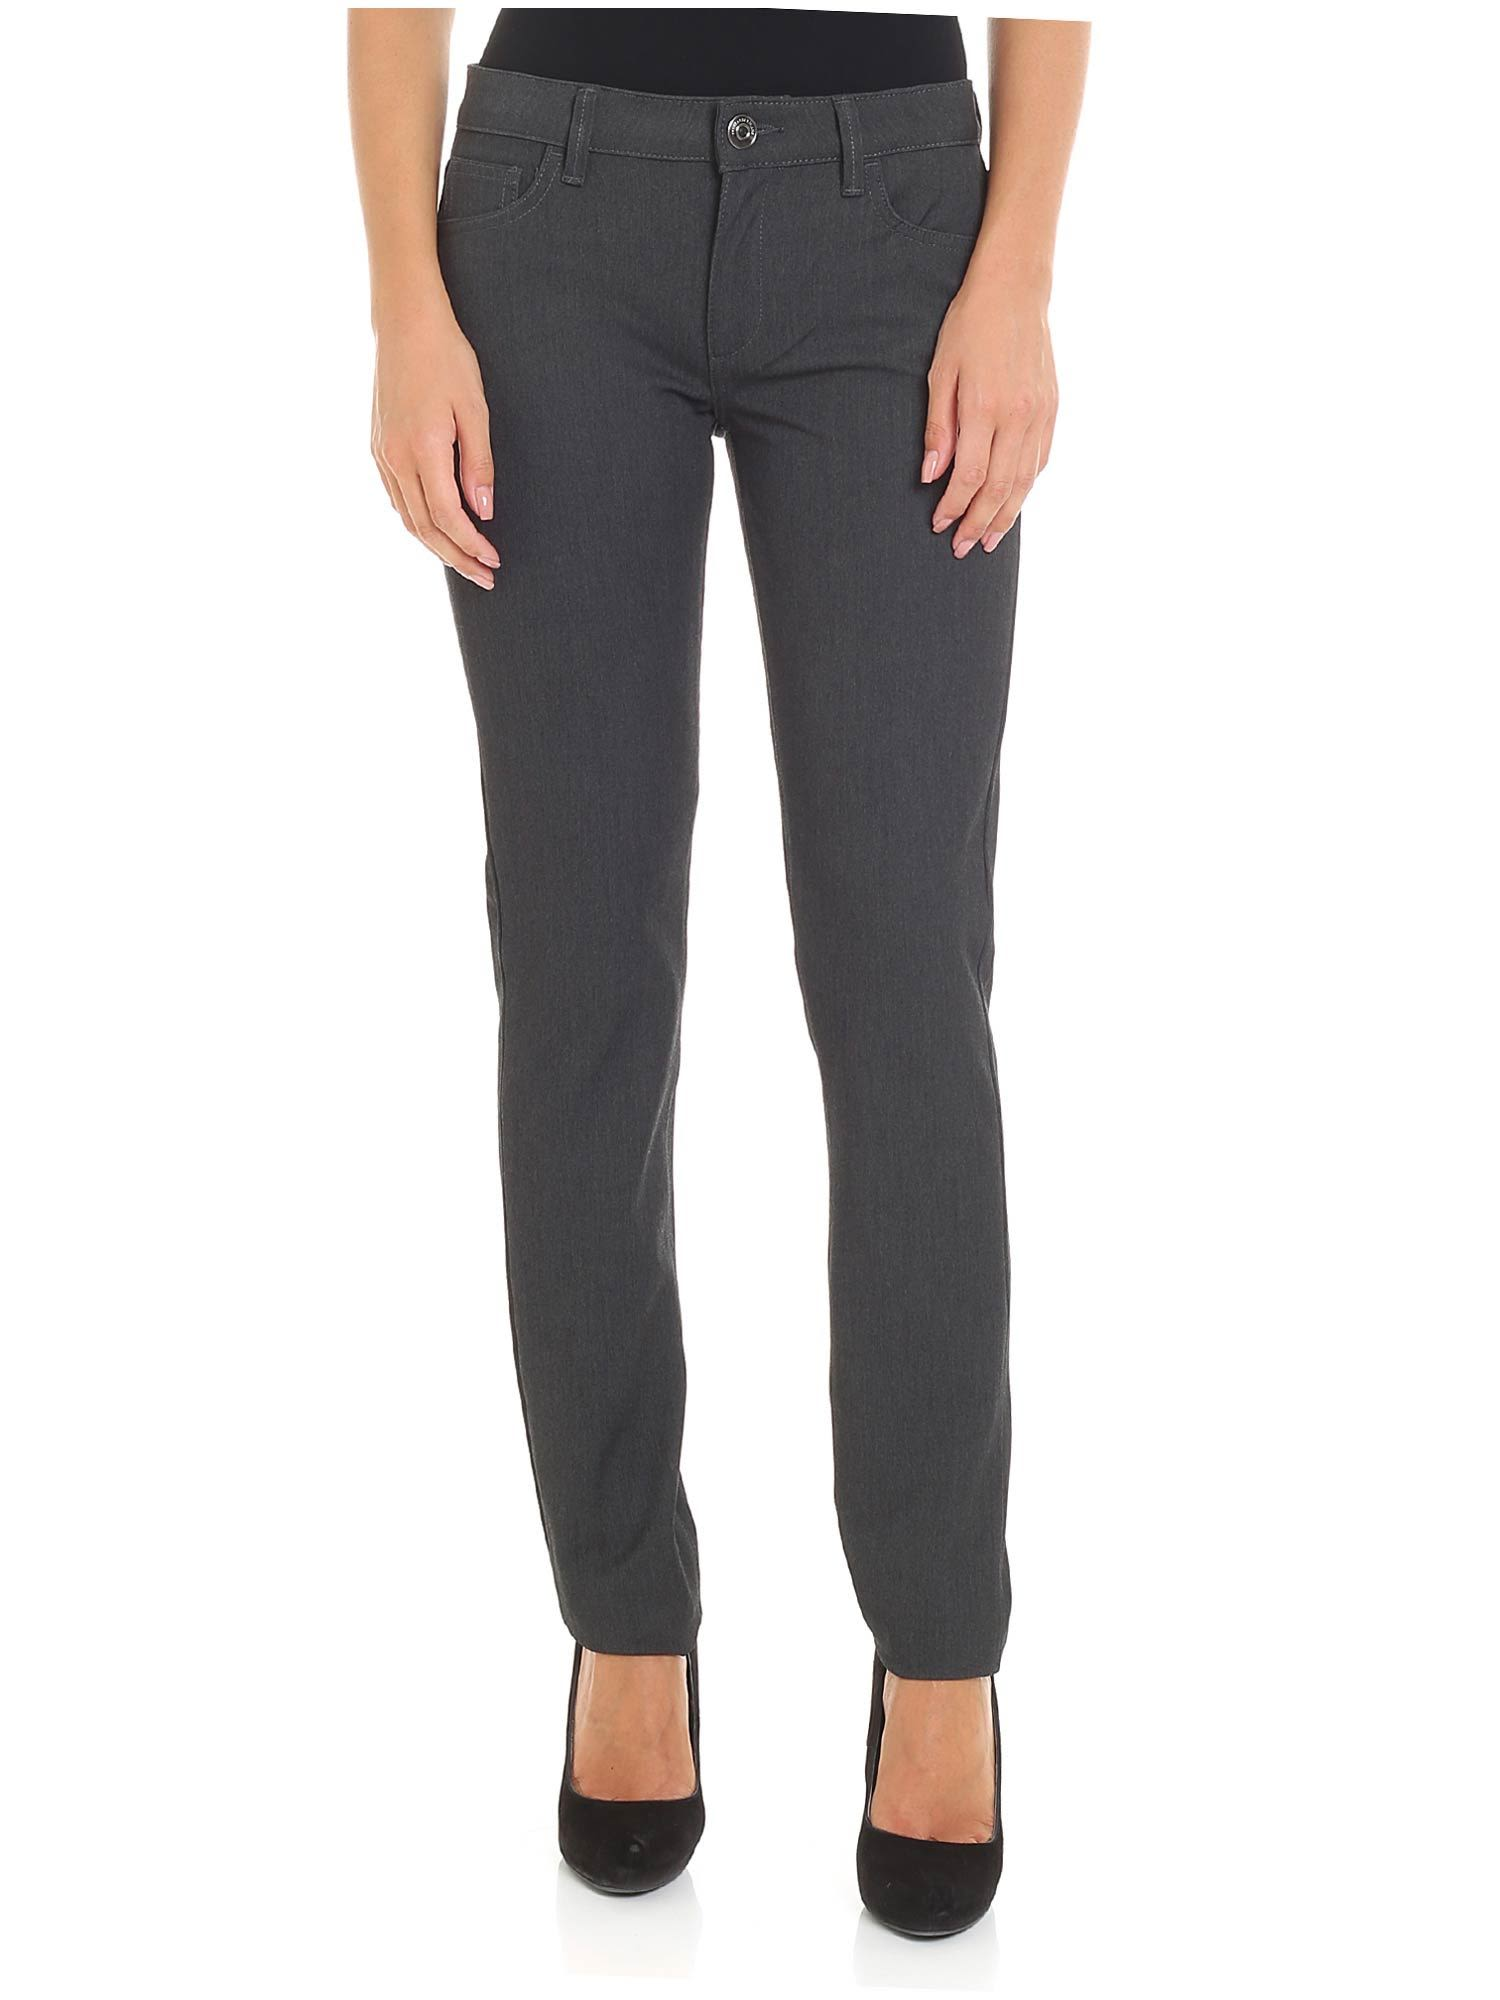 Trussardi Jeans SLIM-FIT JEANS